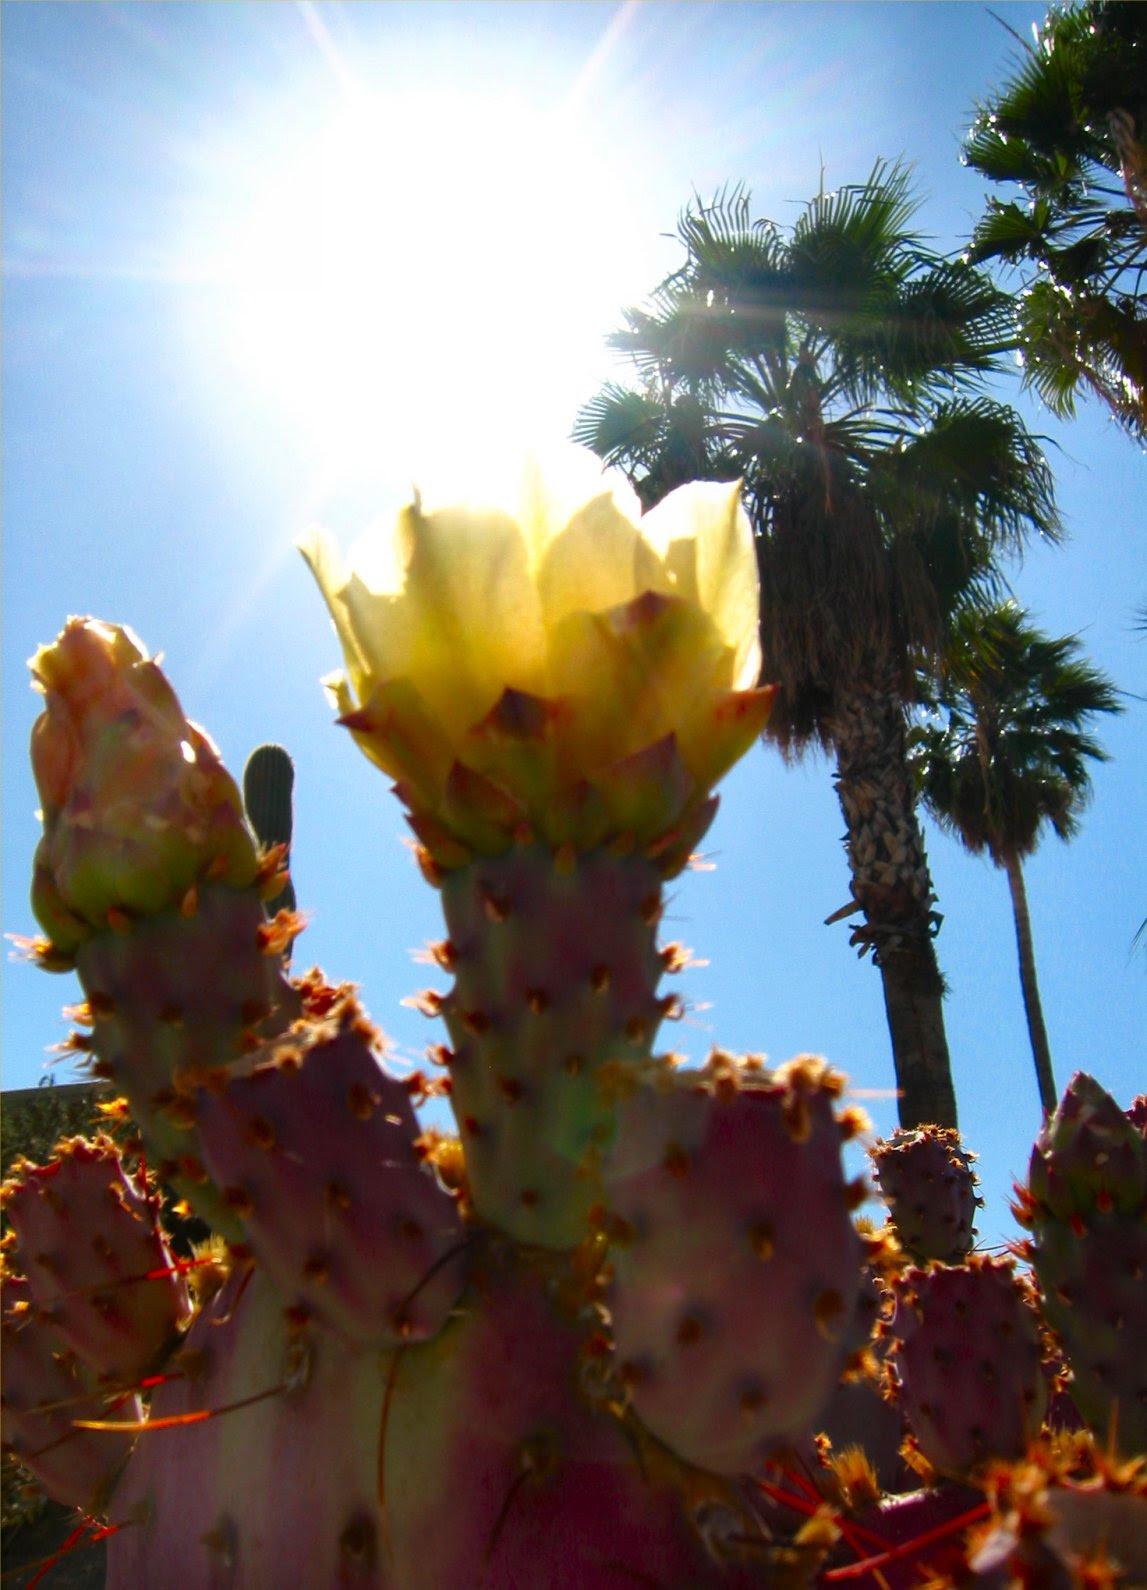 Pear Cactus Flower backlit by Sun. Photo - soul-amp.com